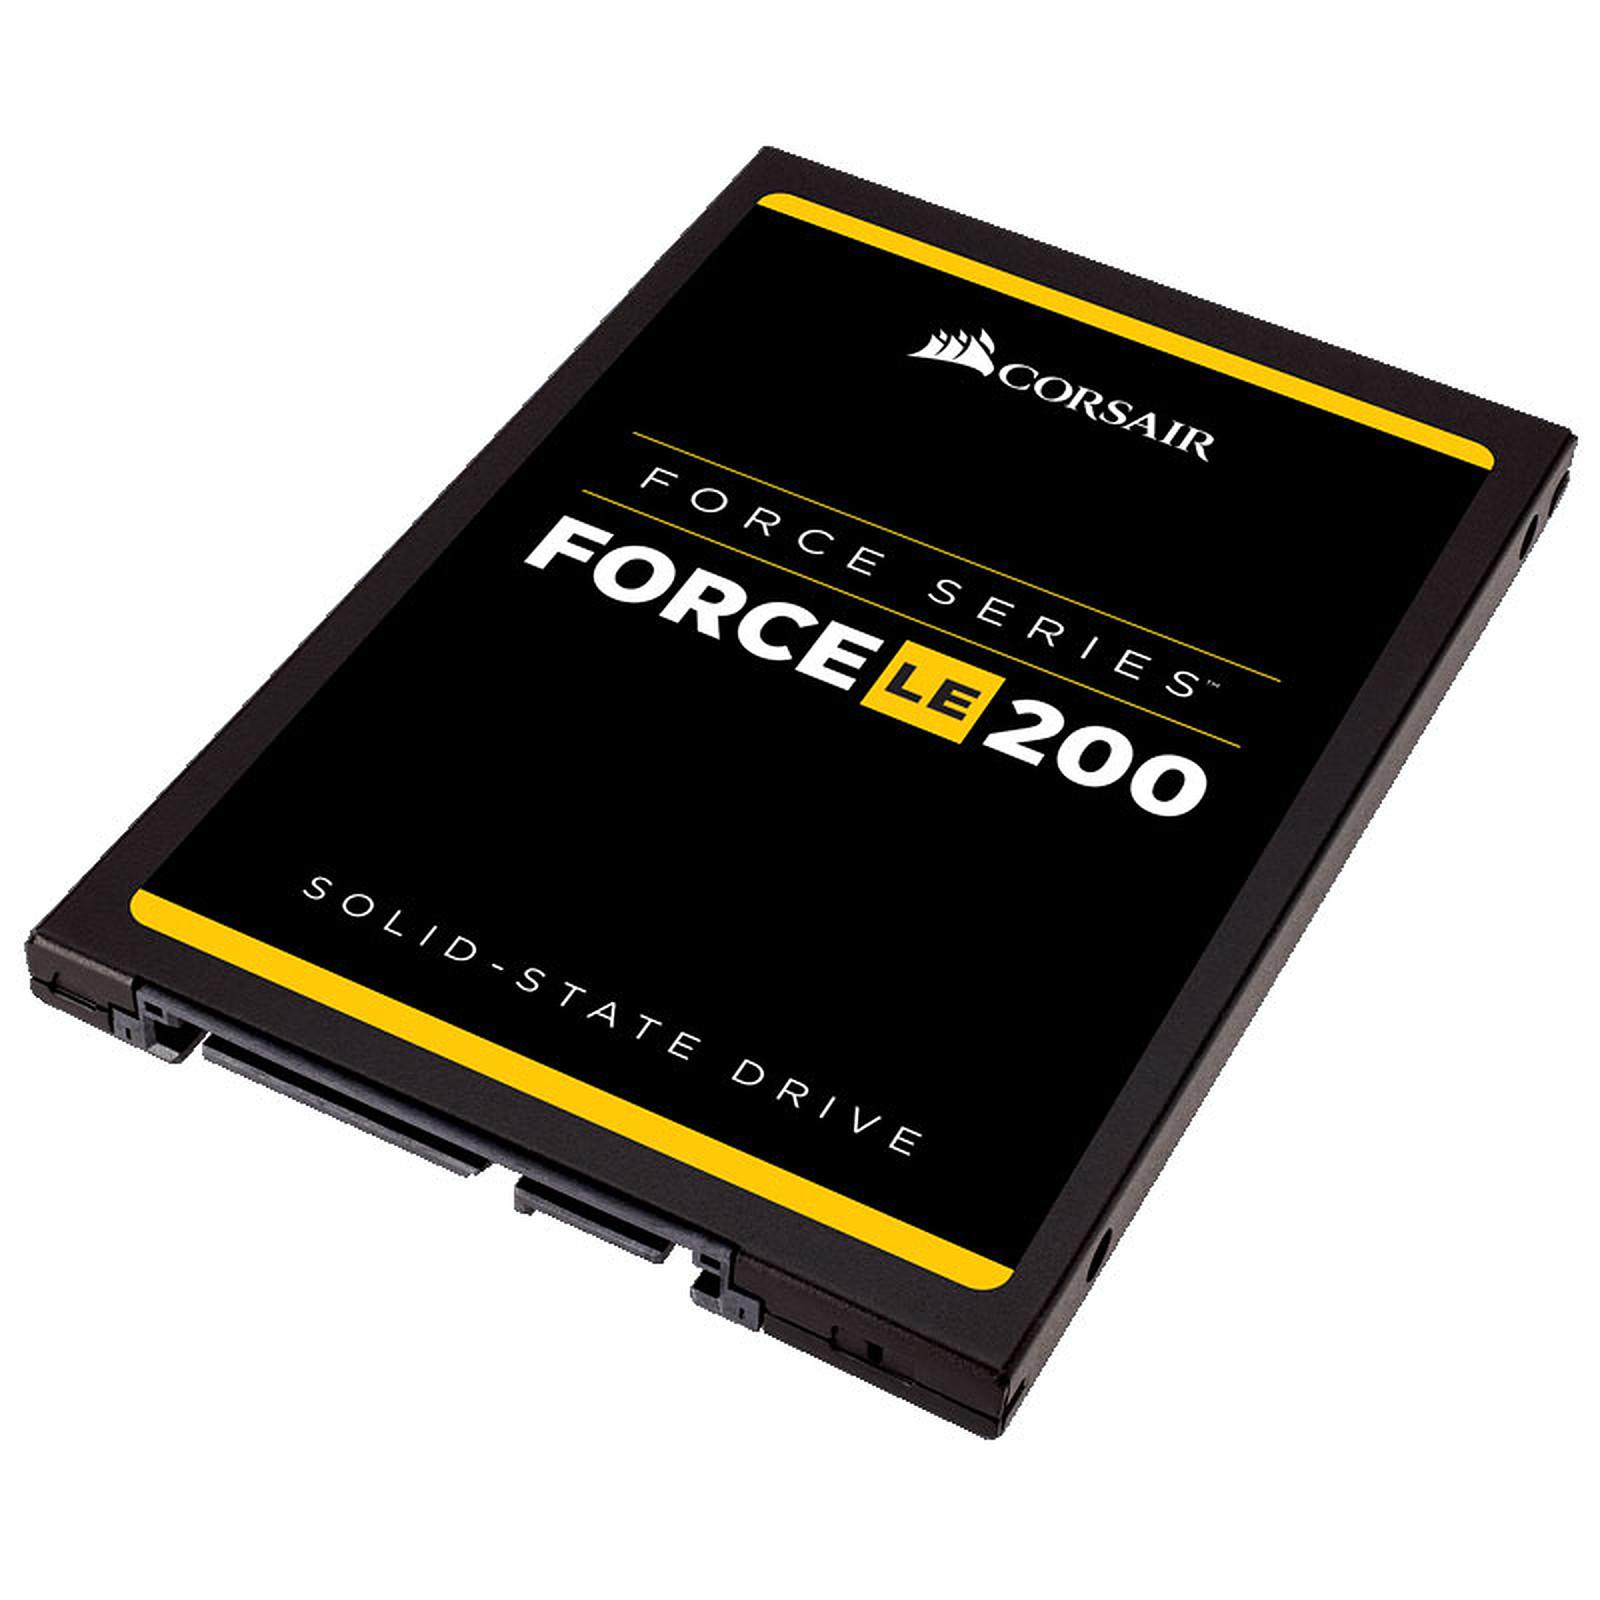 Corsair Force Series LE200 120 Go